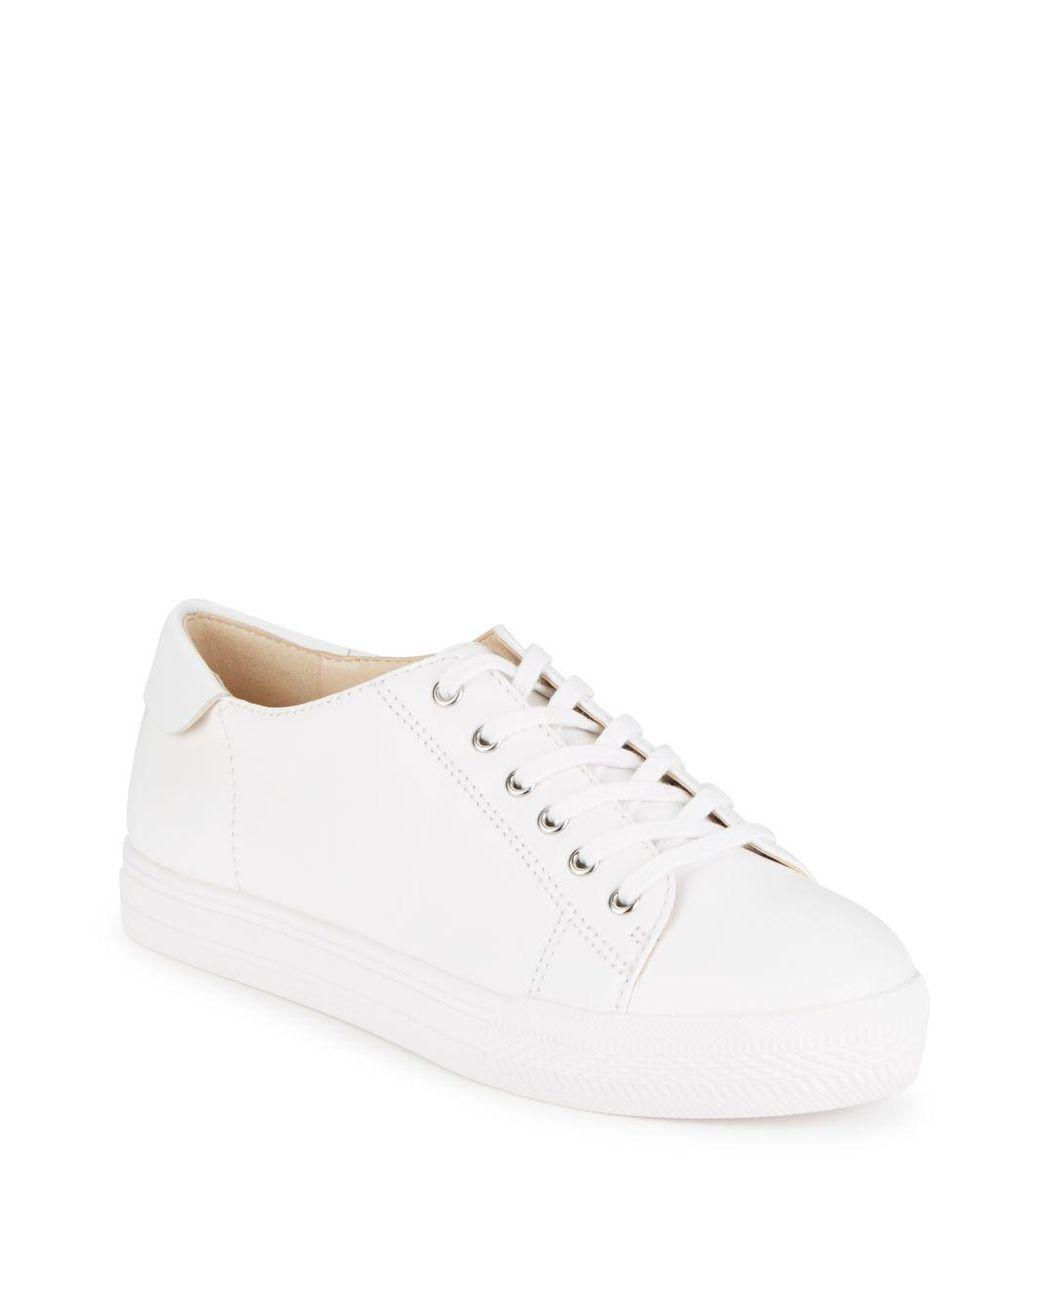 ba58c527 Women's White Patrick Leather Platform Sneakers | Fashion needs [ok ...